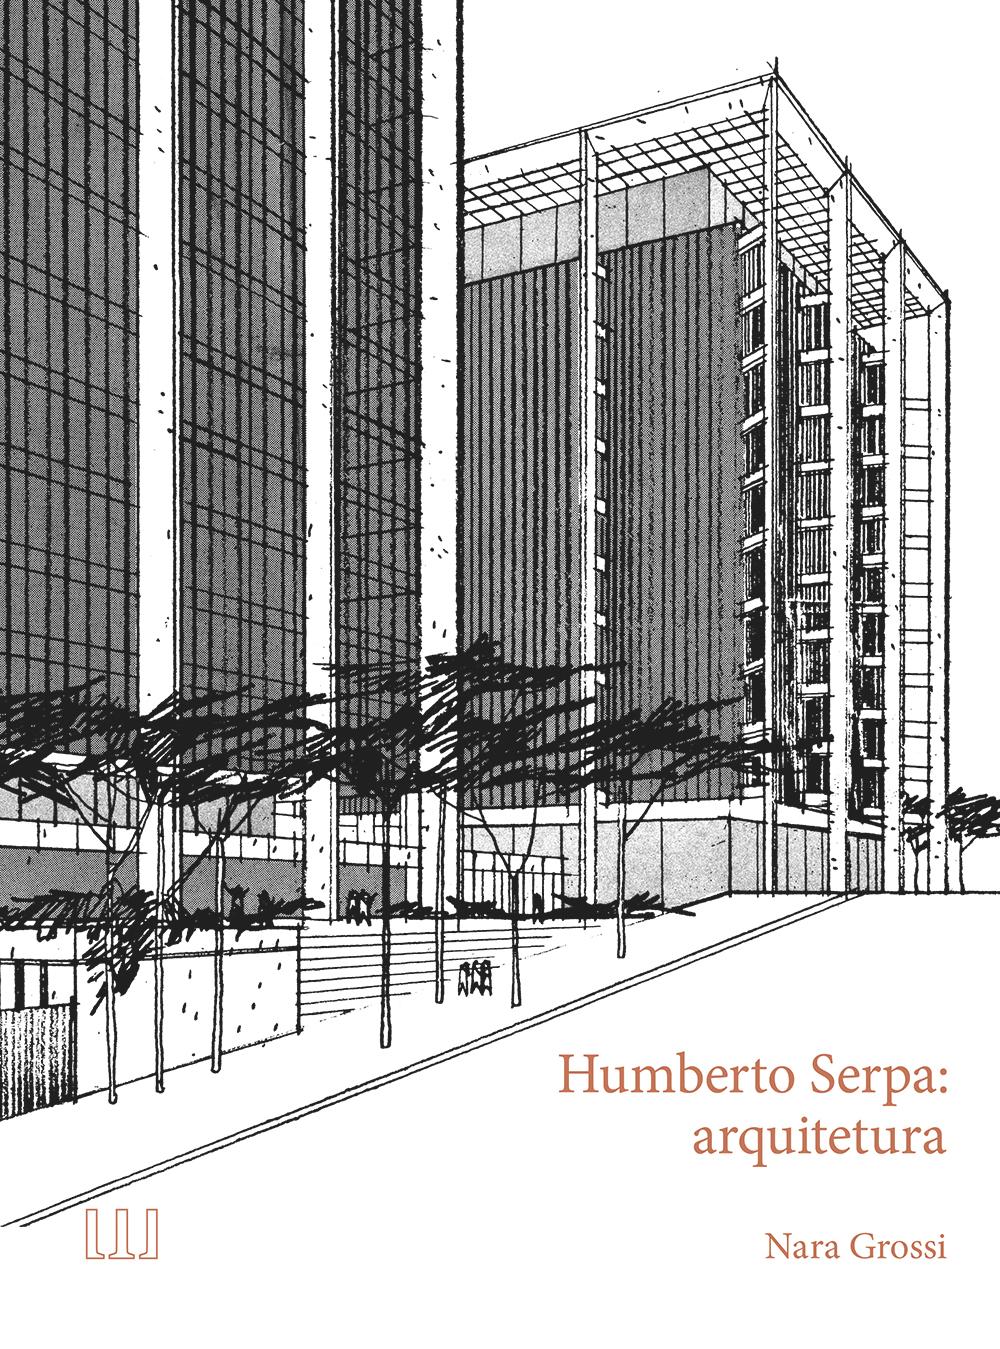 capa_livro03_Serpa_221x298mm_press